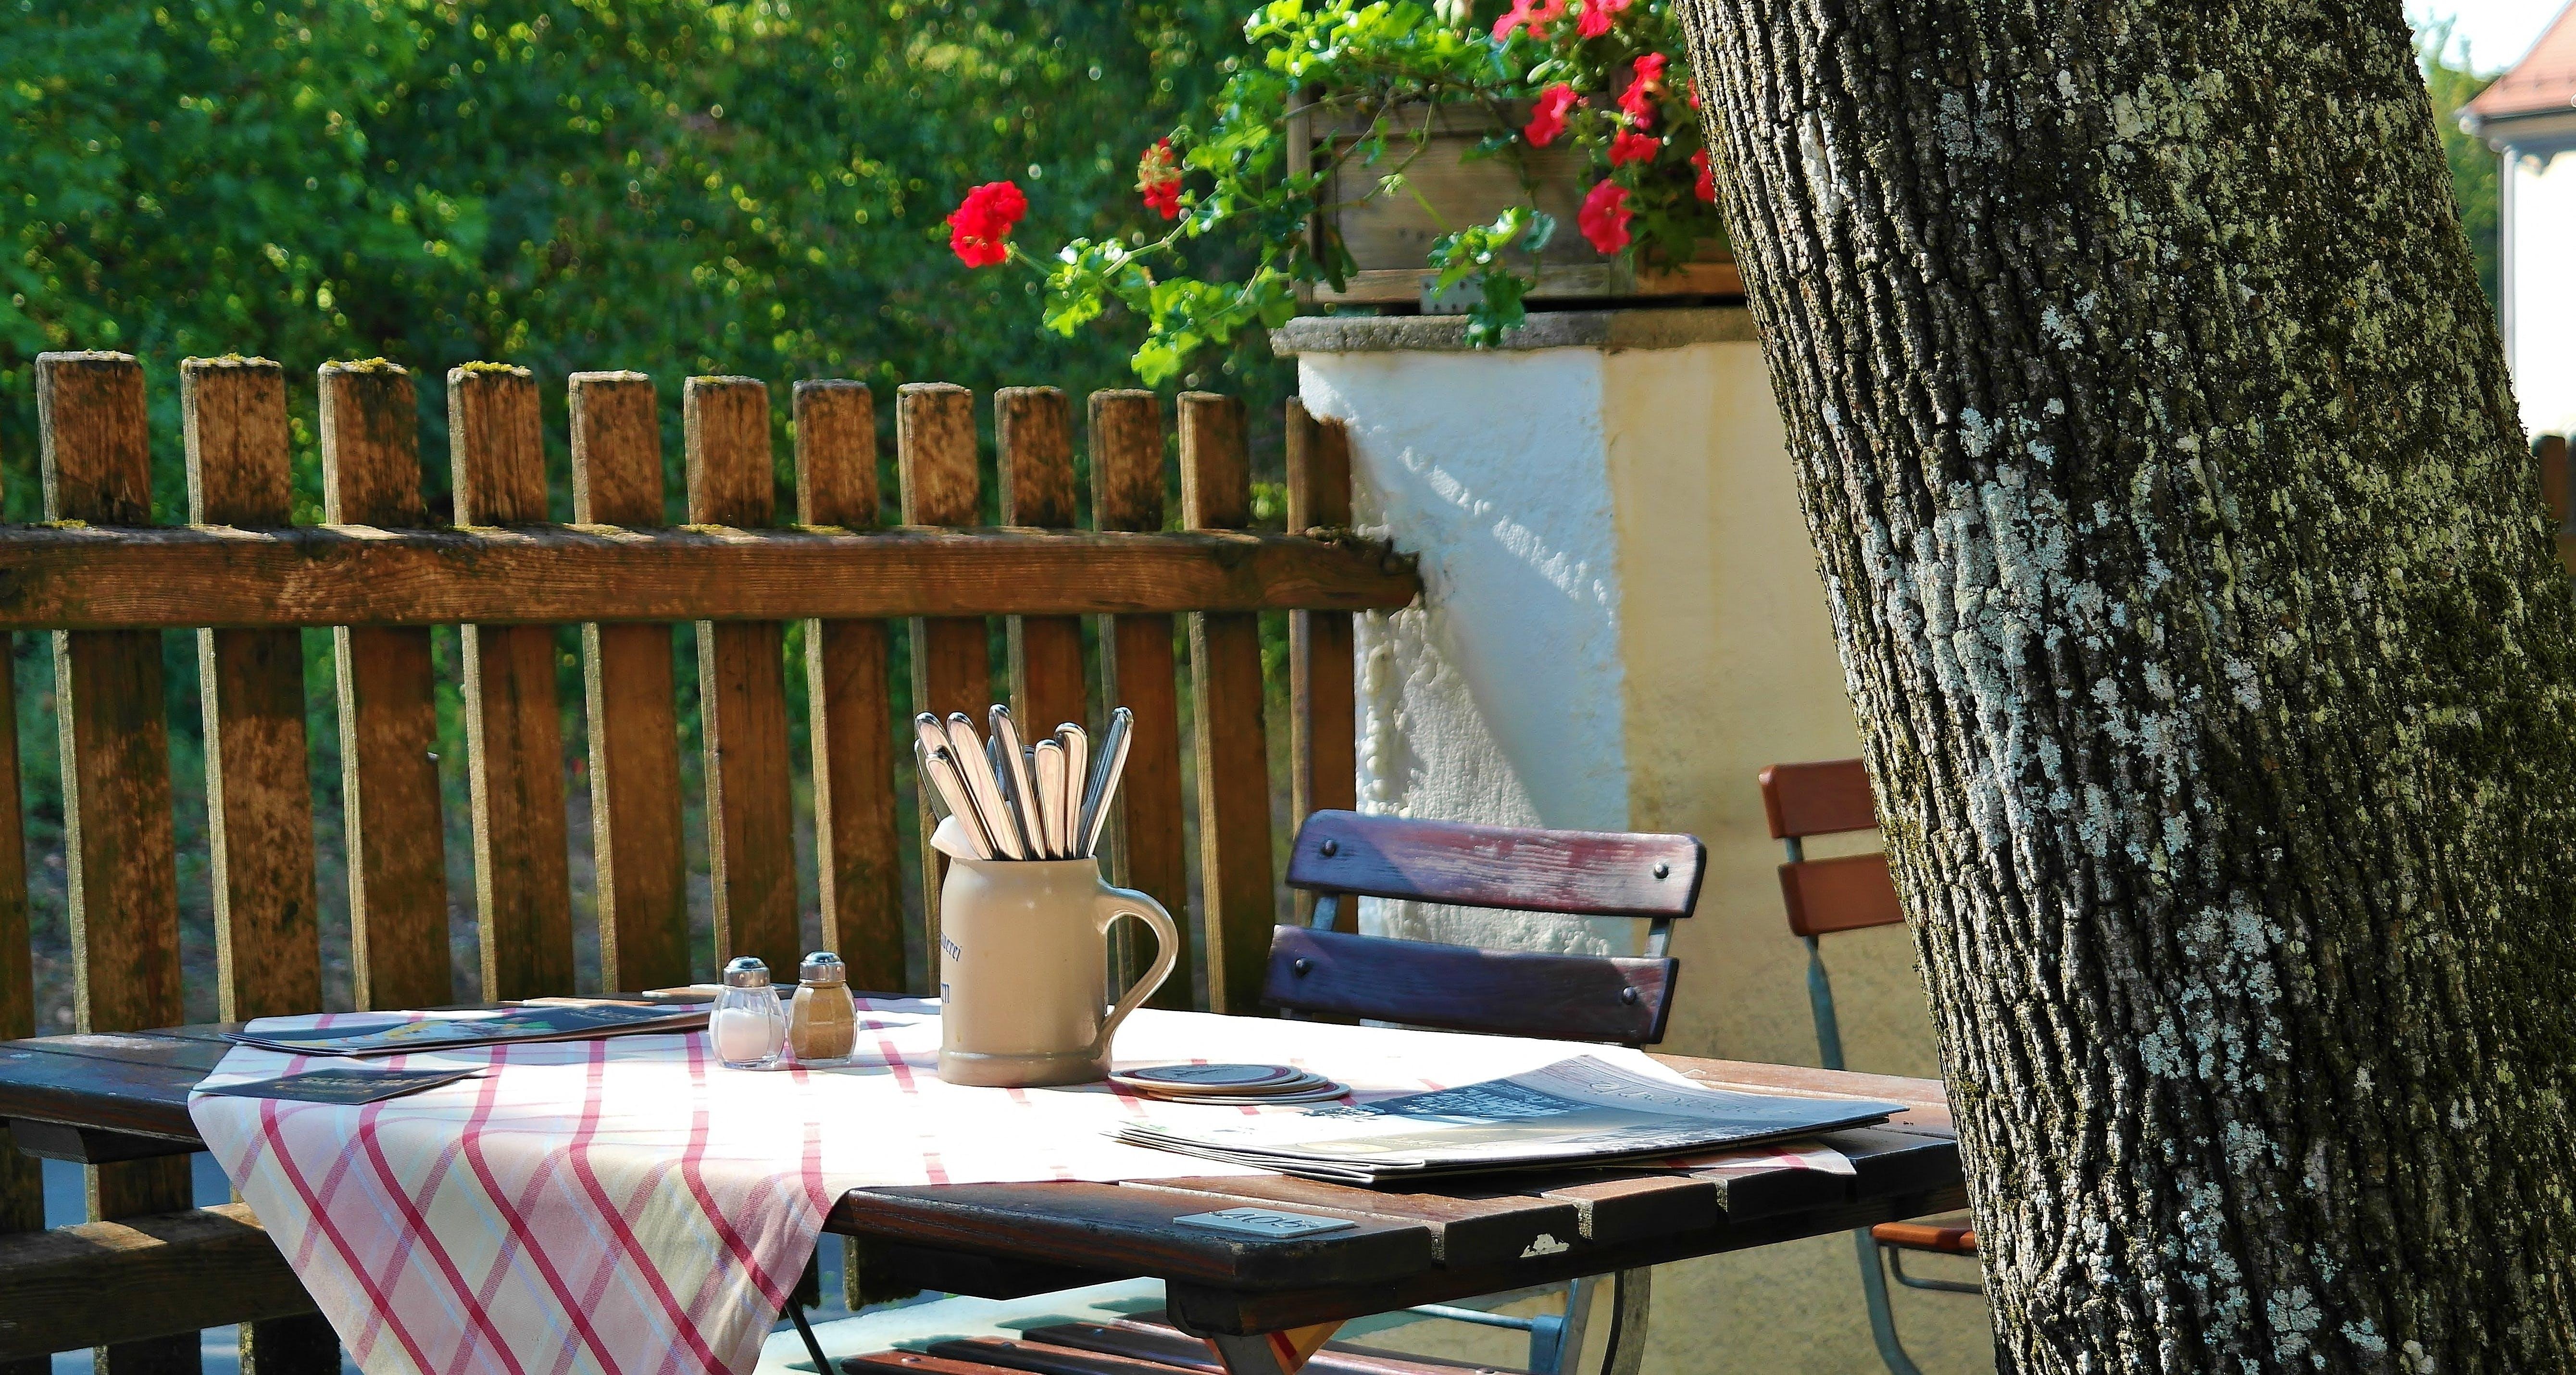 Free stock photo of Bavaria, beer, beer garden, chairs